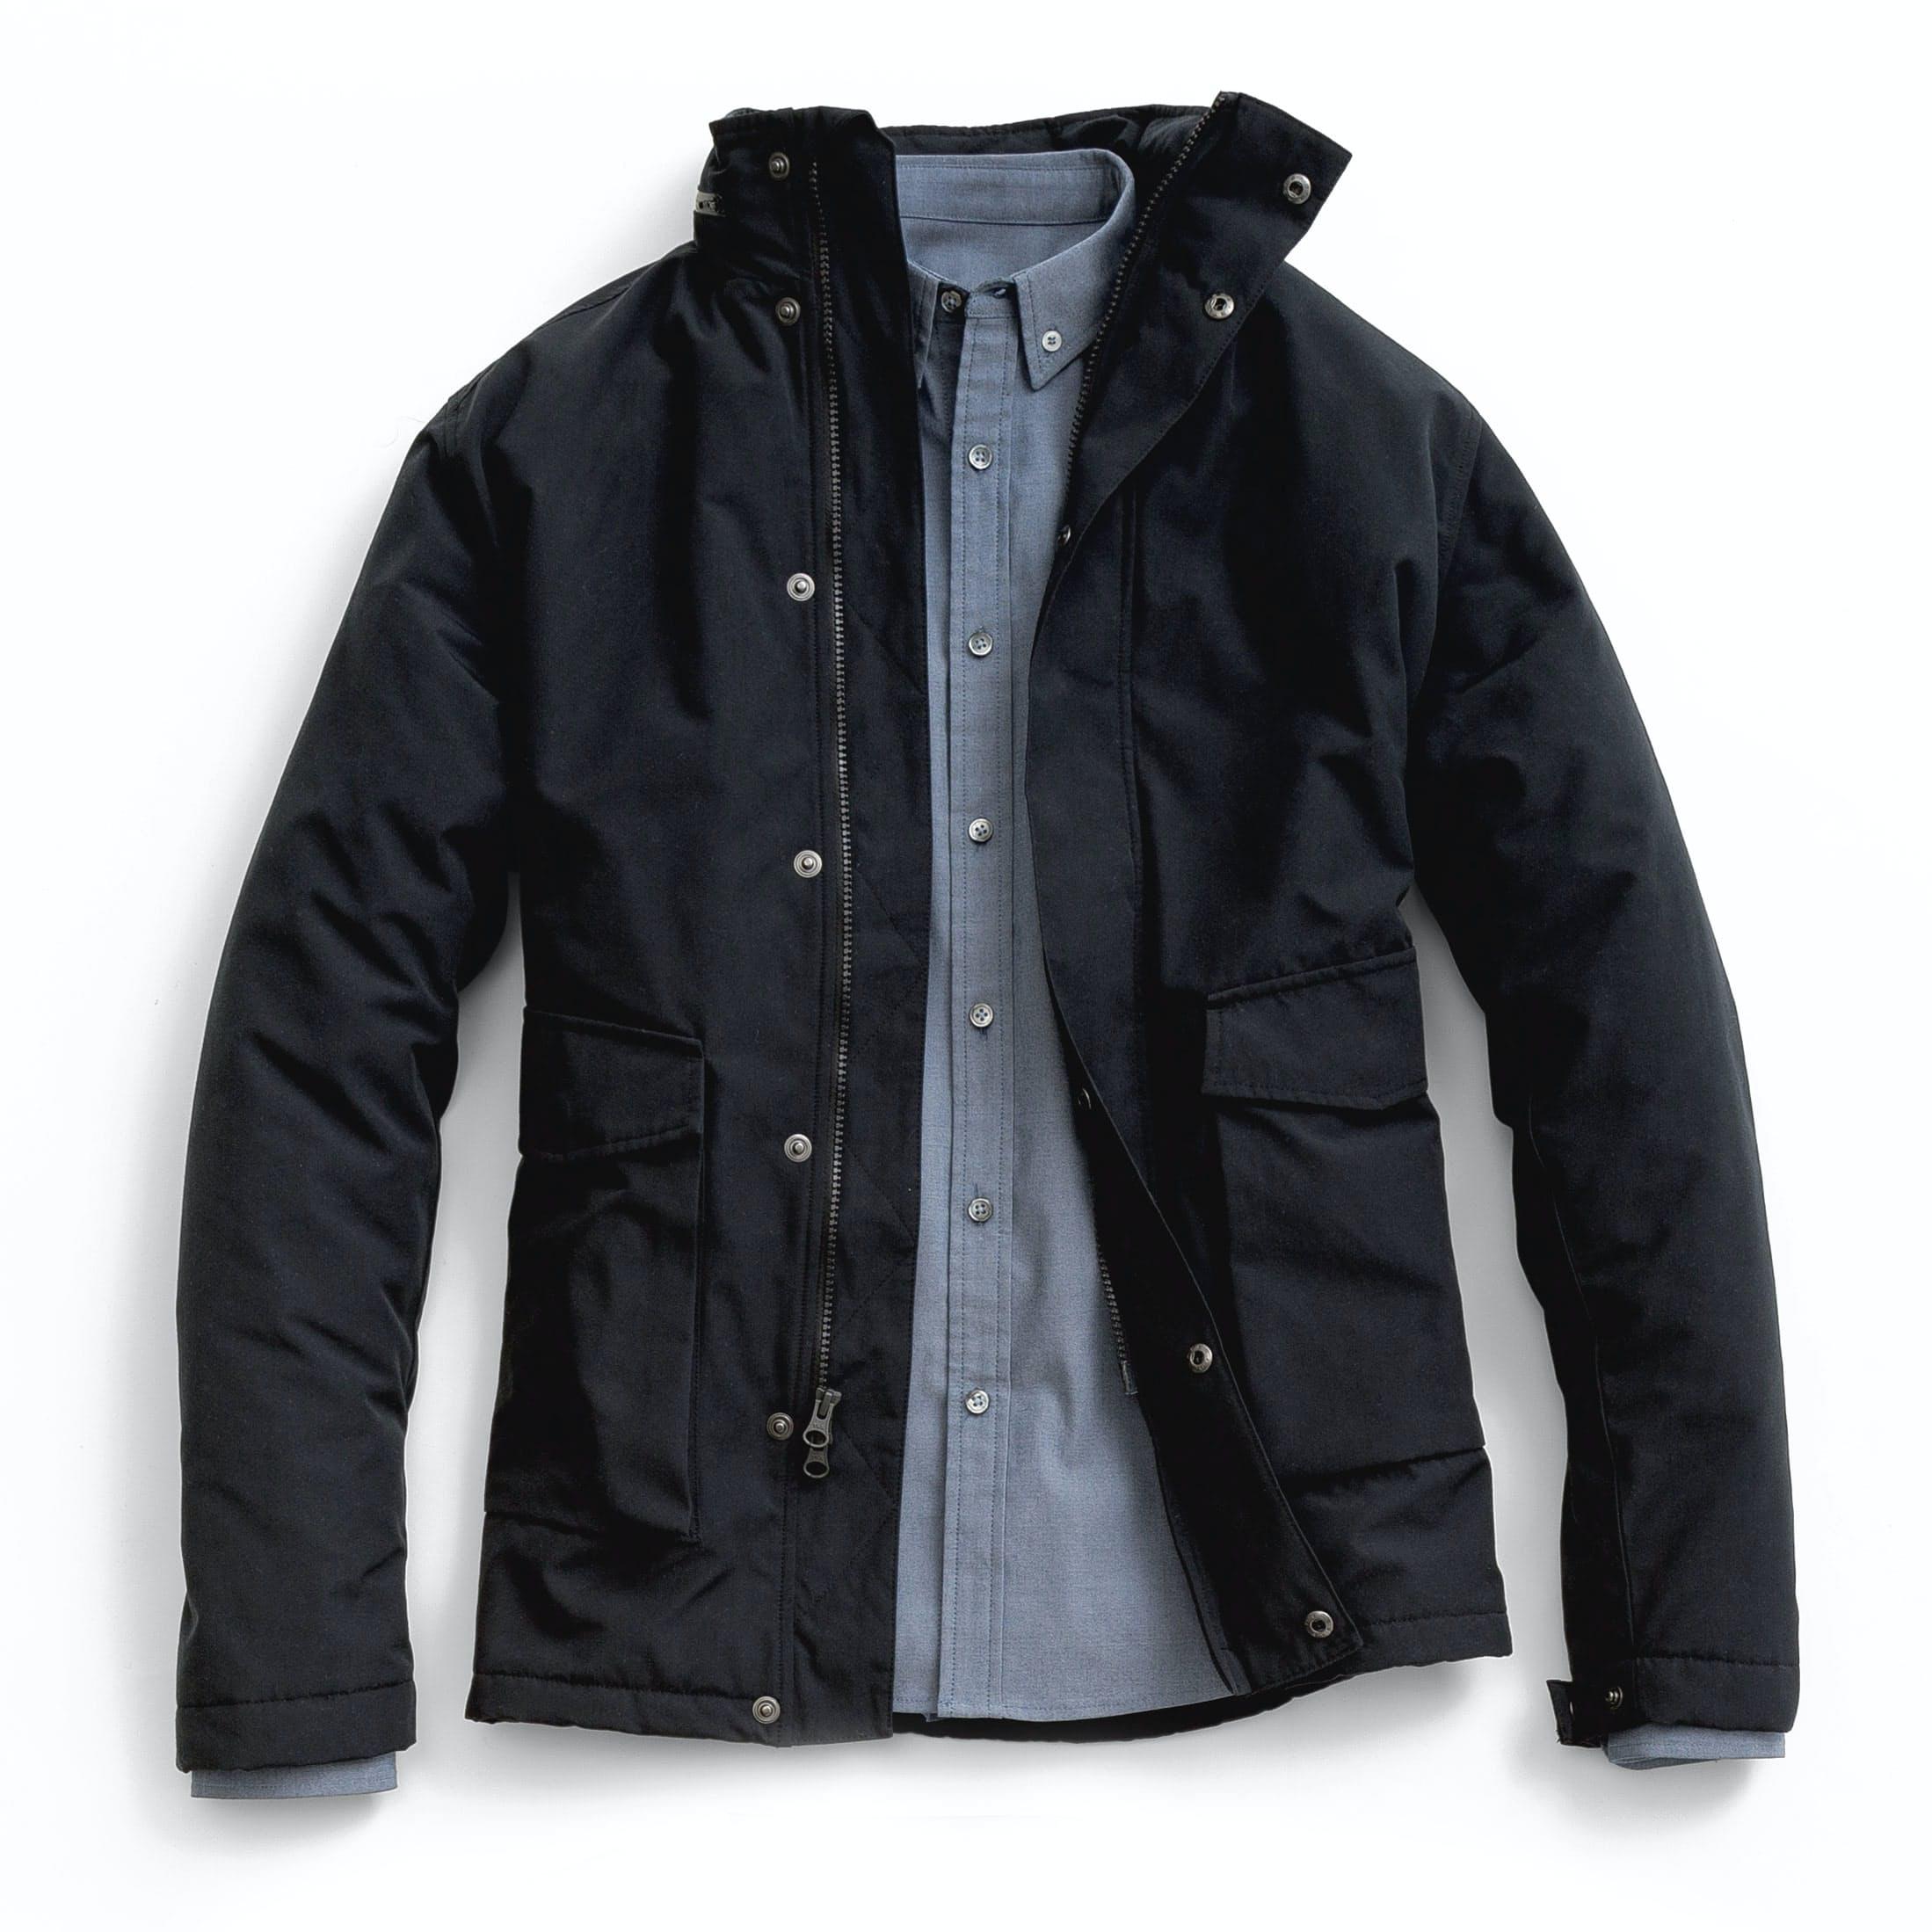 Osdqg5mpi9 proof field jacket 0 original